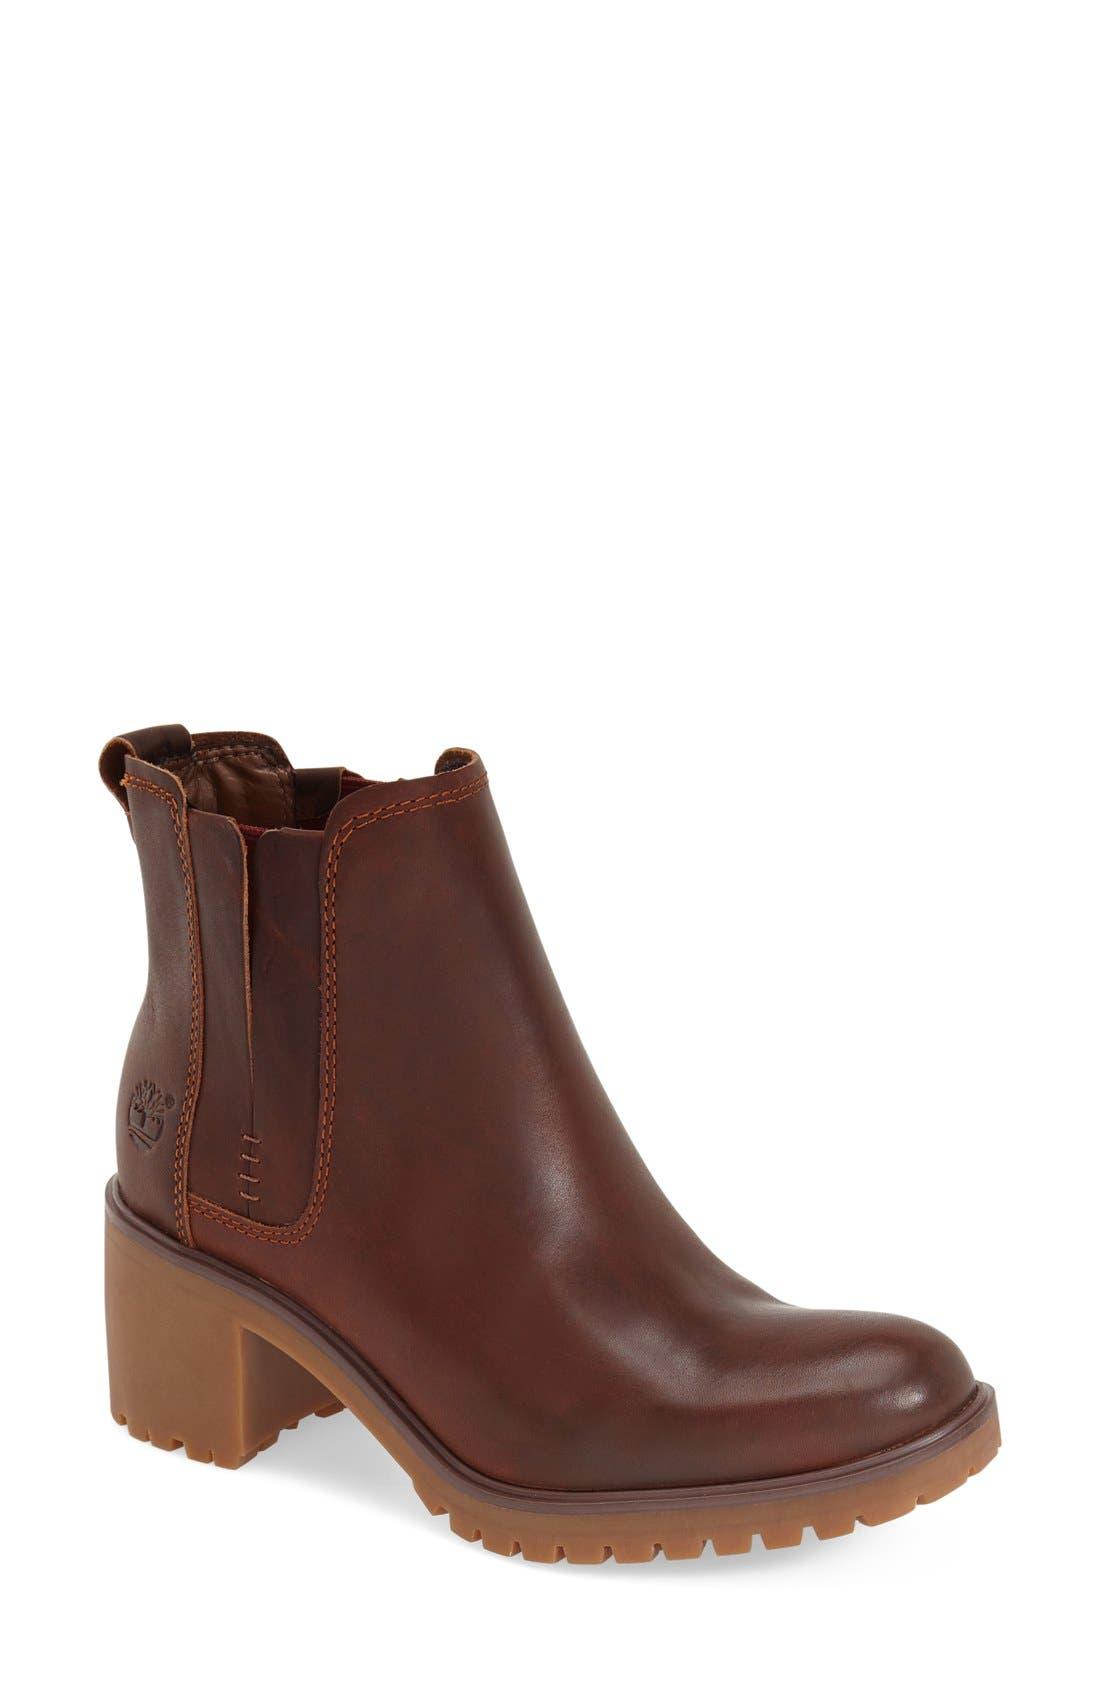 Alternate Image 1 Selected - Timberland 'Avery' Chelsea Boot (Women)